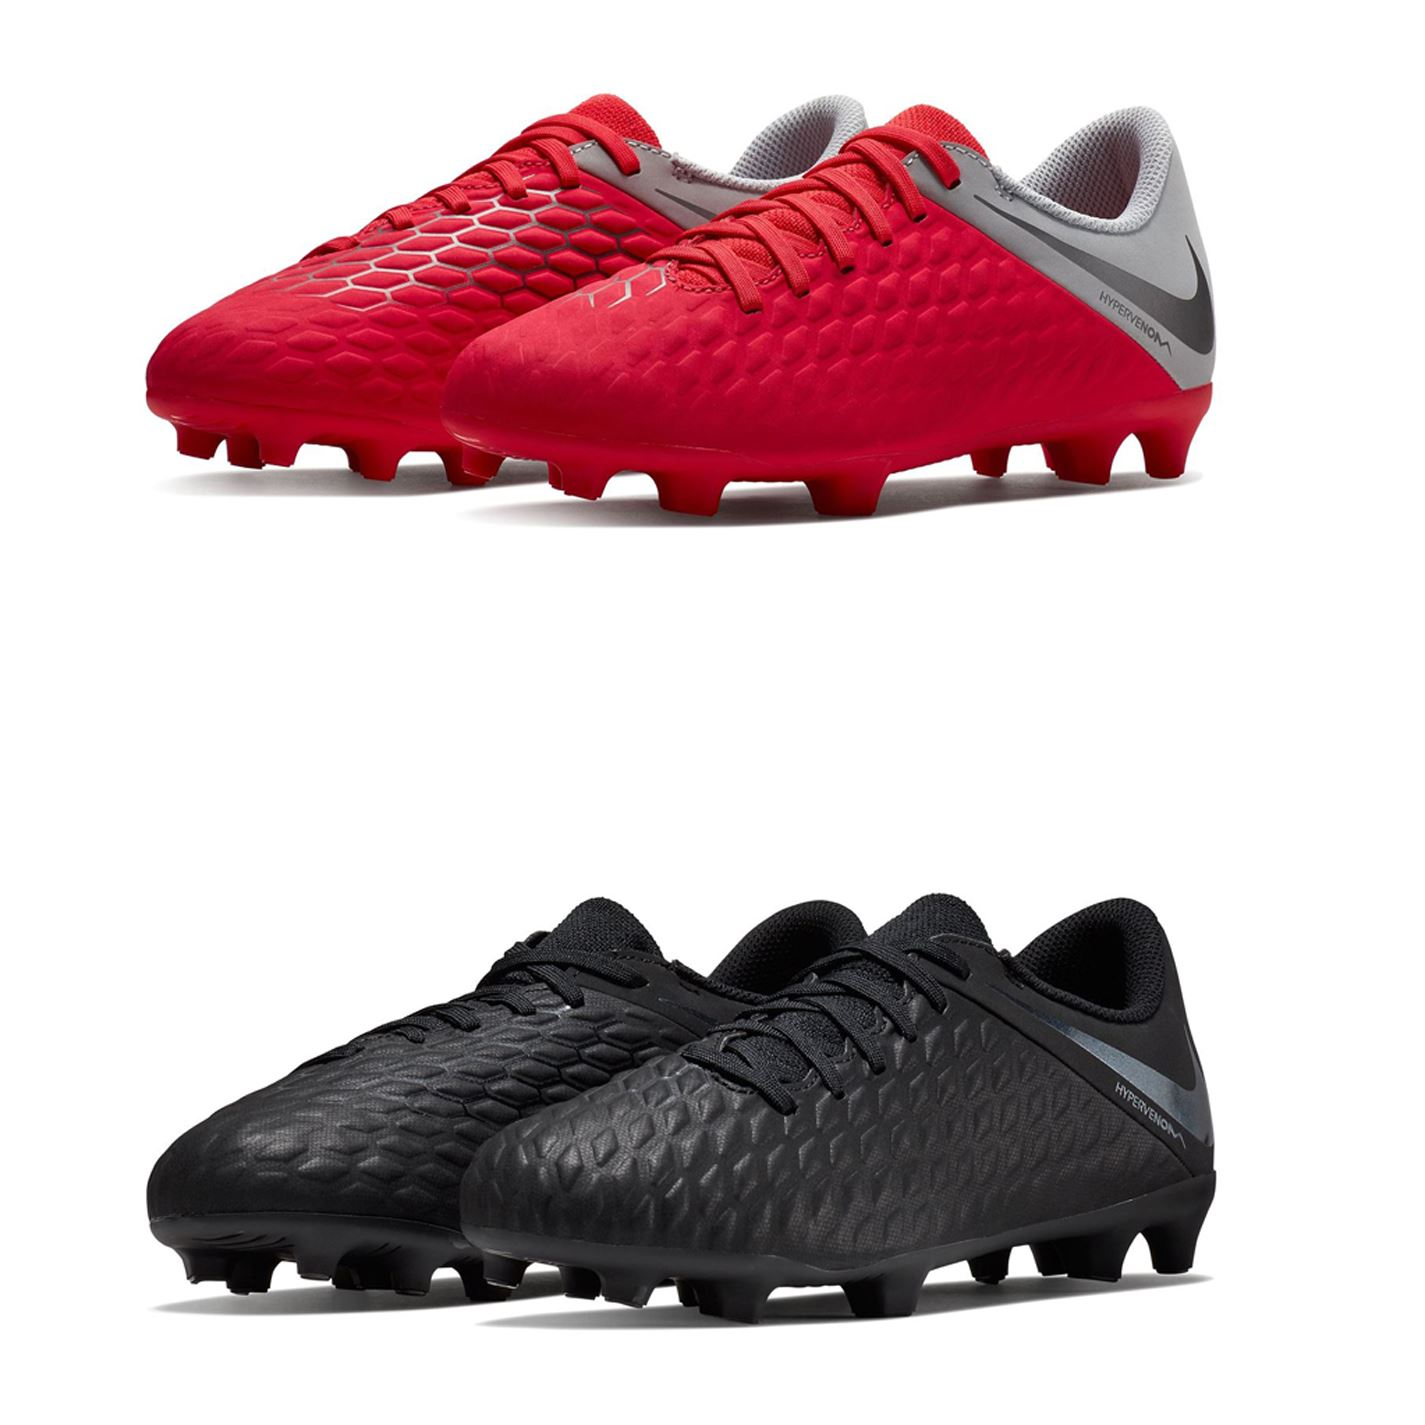 online retailer a7e3e ea68b Details about Nike Hypervenom Phantom Club Firm Ground Football Boots  Juniors Soccer Cleats